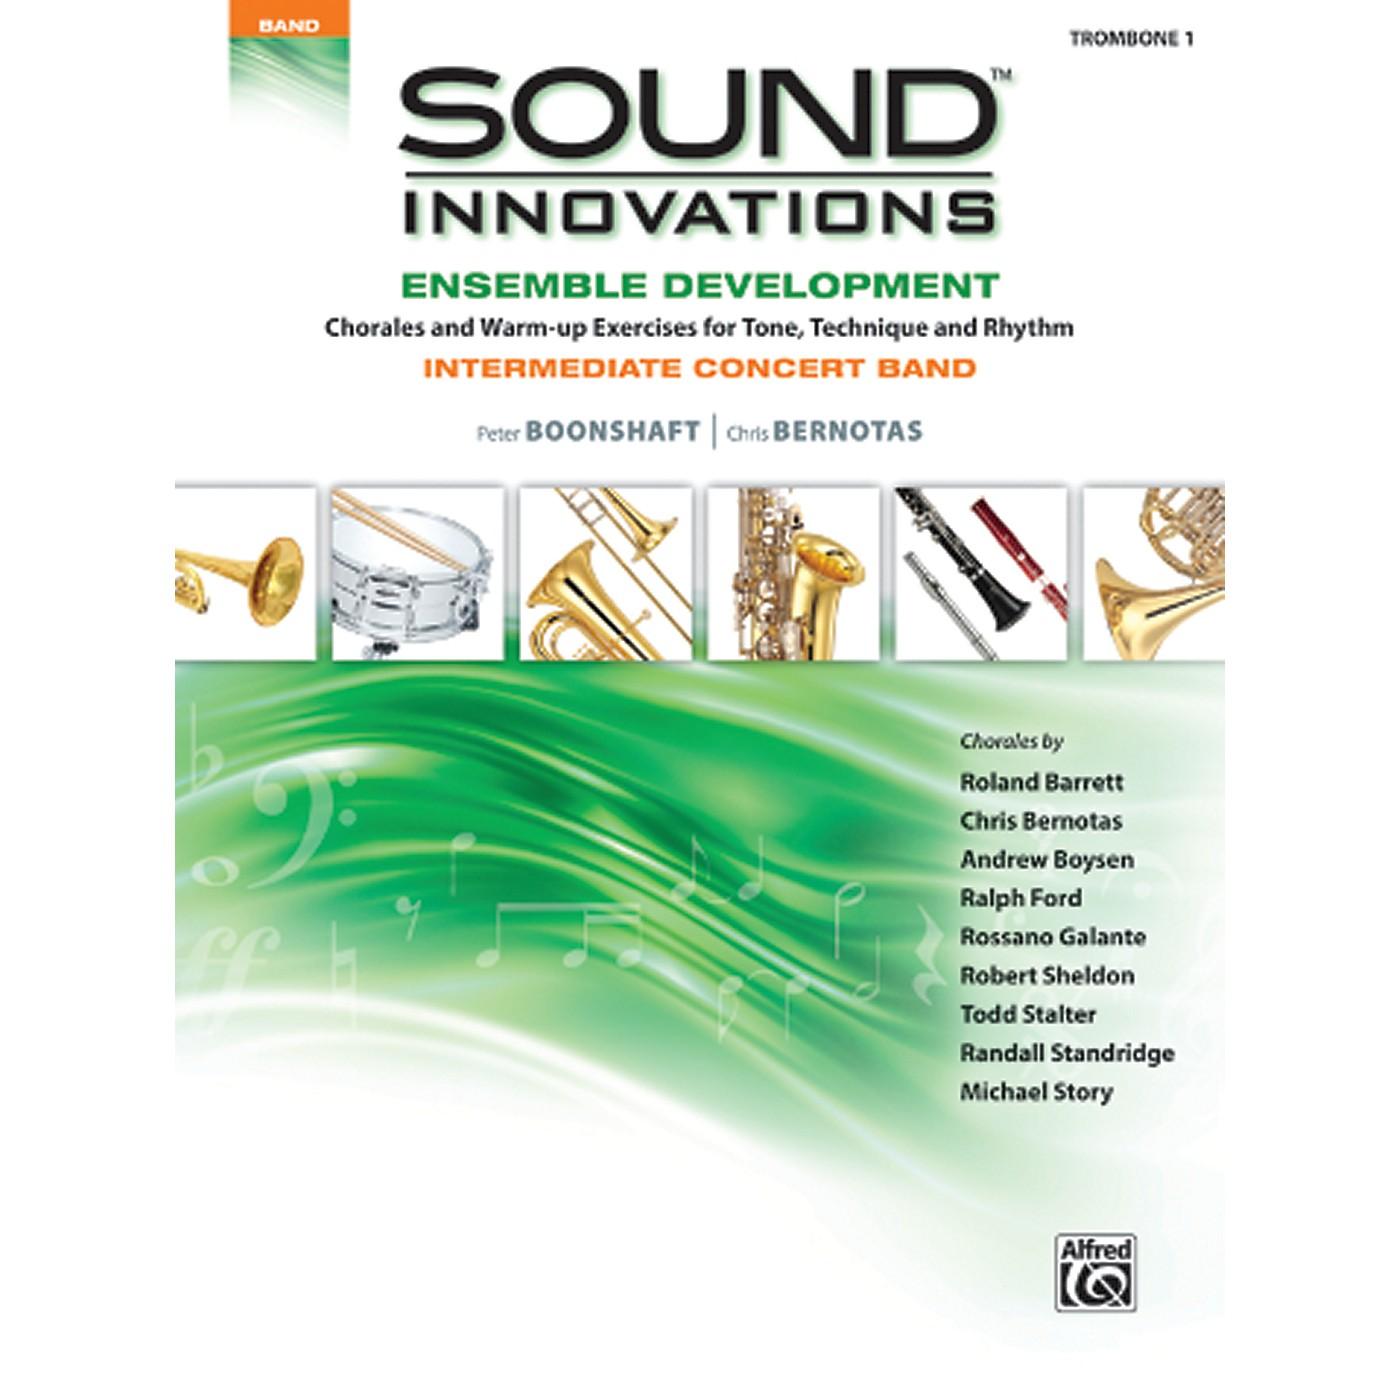 Alfred Sound Innovations Concert Band Ensemble Development Trombone 1 Book thumbnail